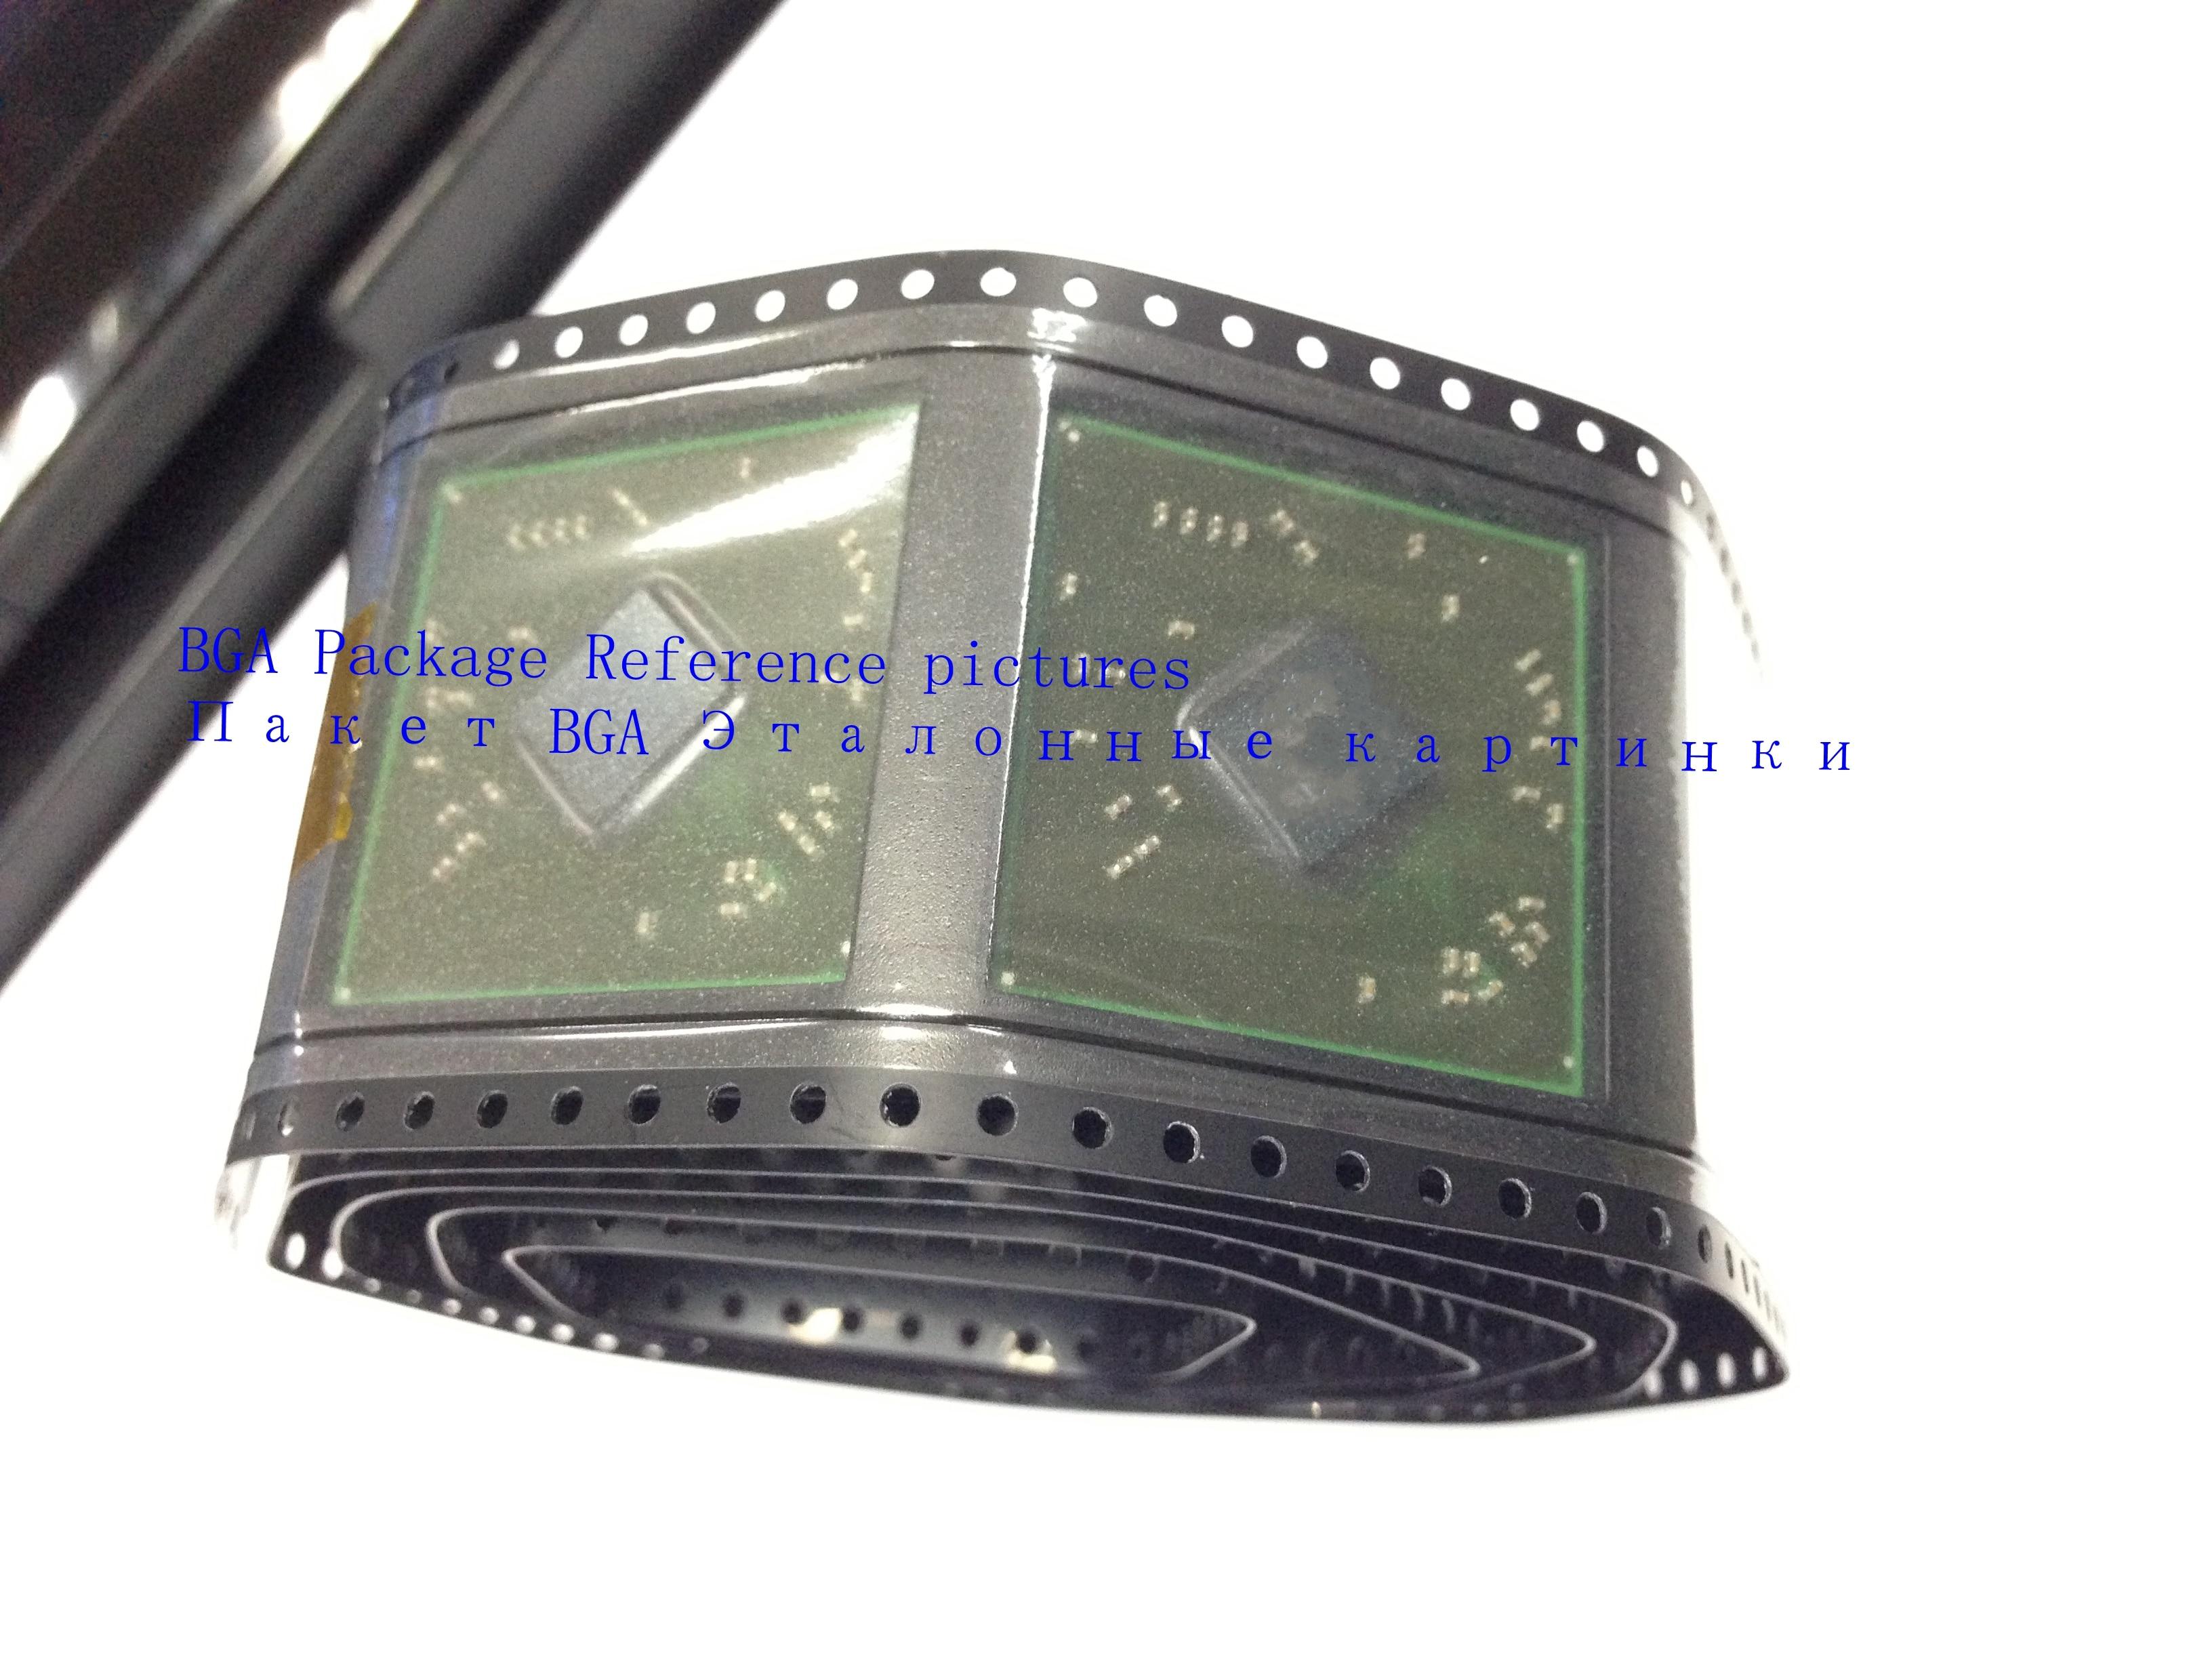 1pcs/lot DC:2012+  glue 100% New G86-920-A2 G86 920 A2 BGA Chipset1pcs/lot DC:2012+  glue 100% New G86-920-A2 G86 920 A2 BGA Chipset